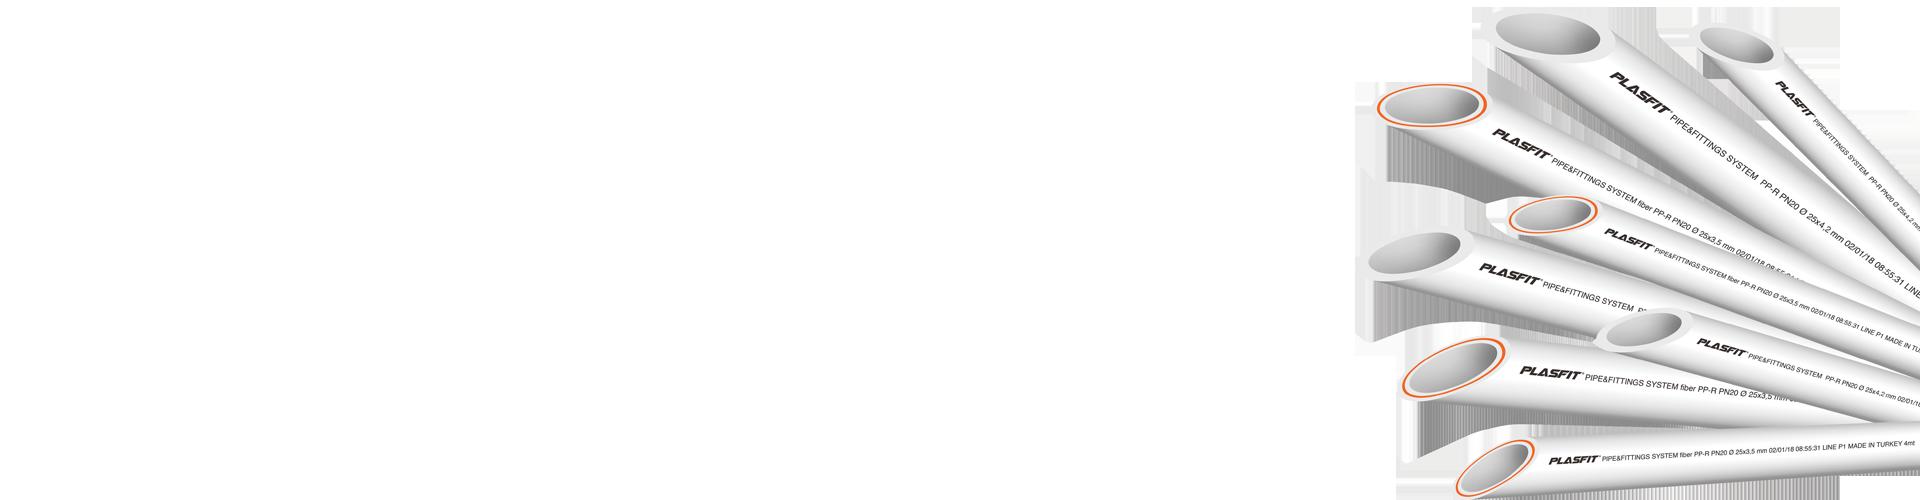 Plasfit Boru Arkaplan